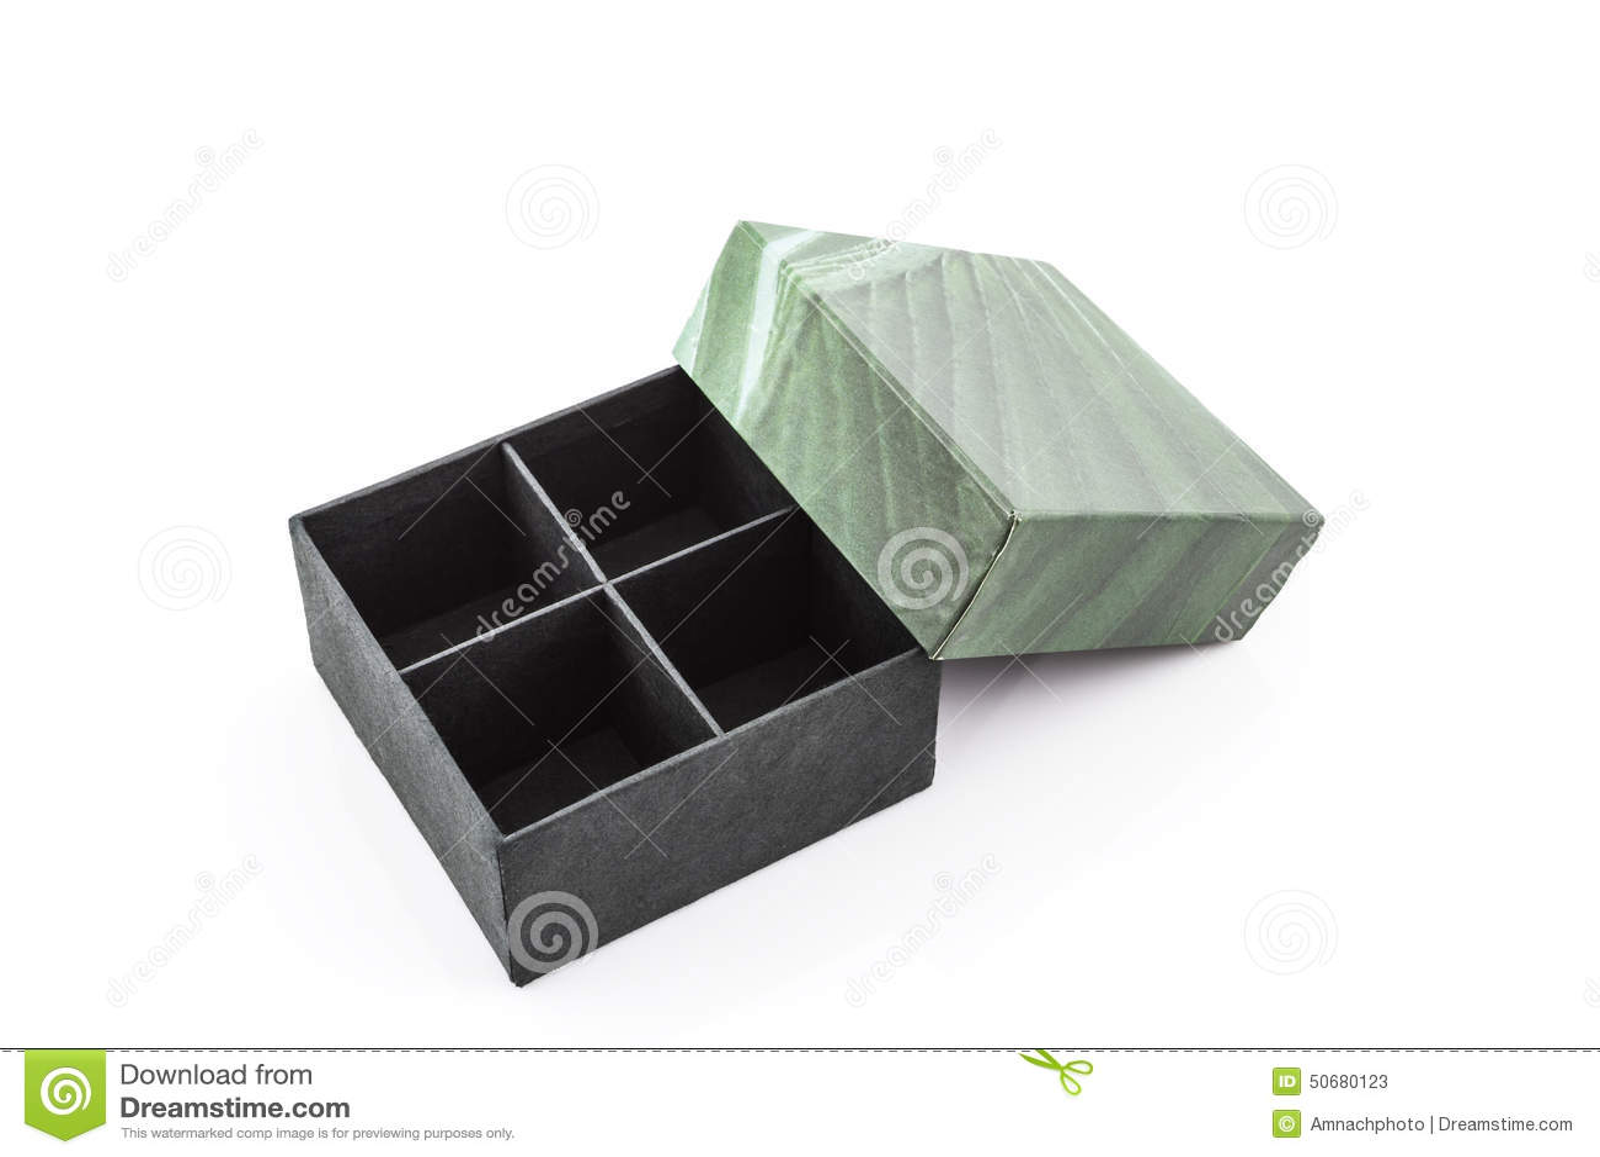 Download 绿皮书箱子 库存图片. 图片 包括有 粗砺, 对象, 隔间, 纸盒, 空白的, 棚车, 纸板, 开放, 运费 - 50680123